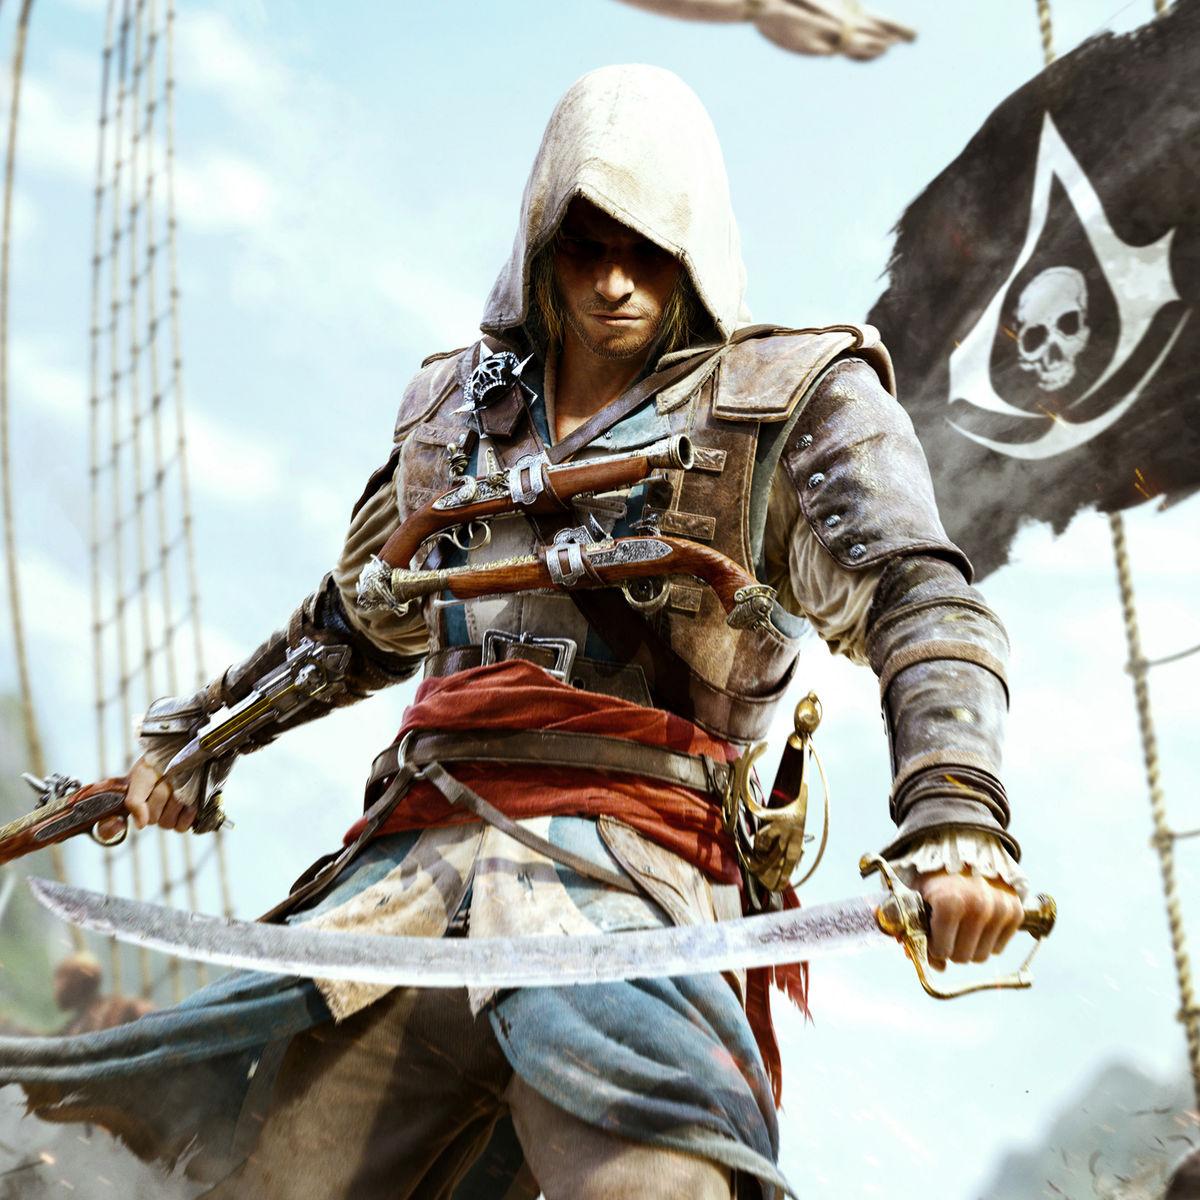 assassins_creed_4_black_flag_game-wide.jpg